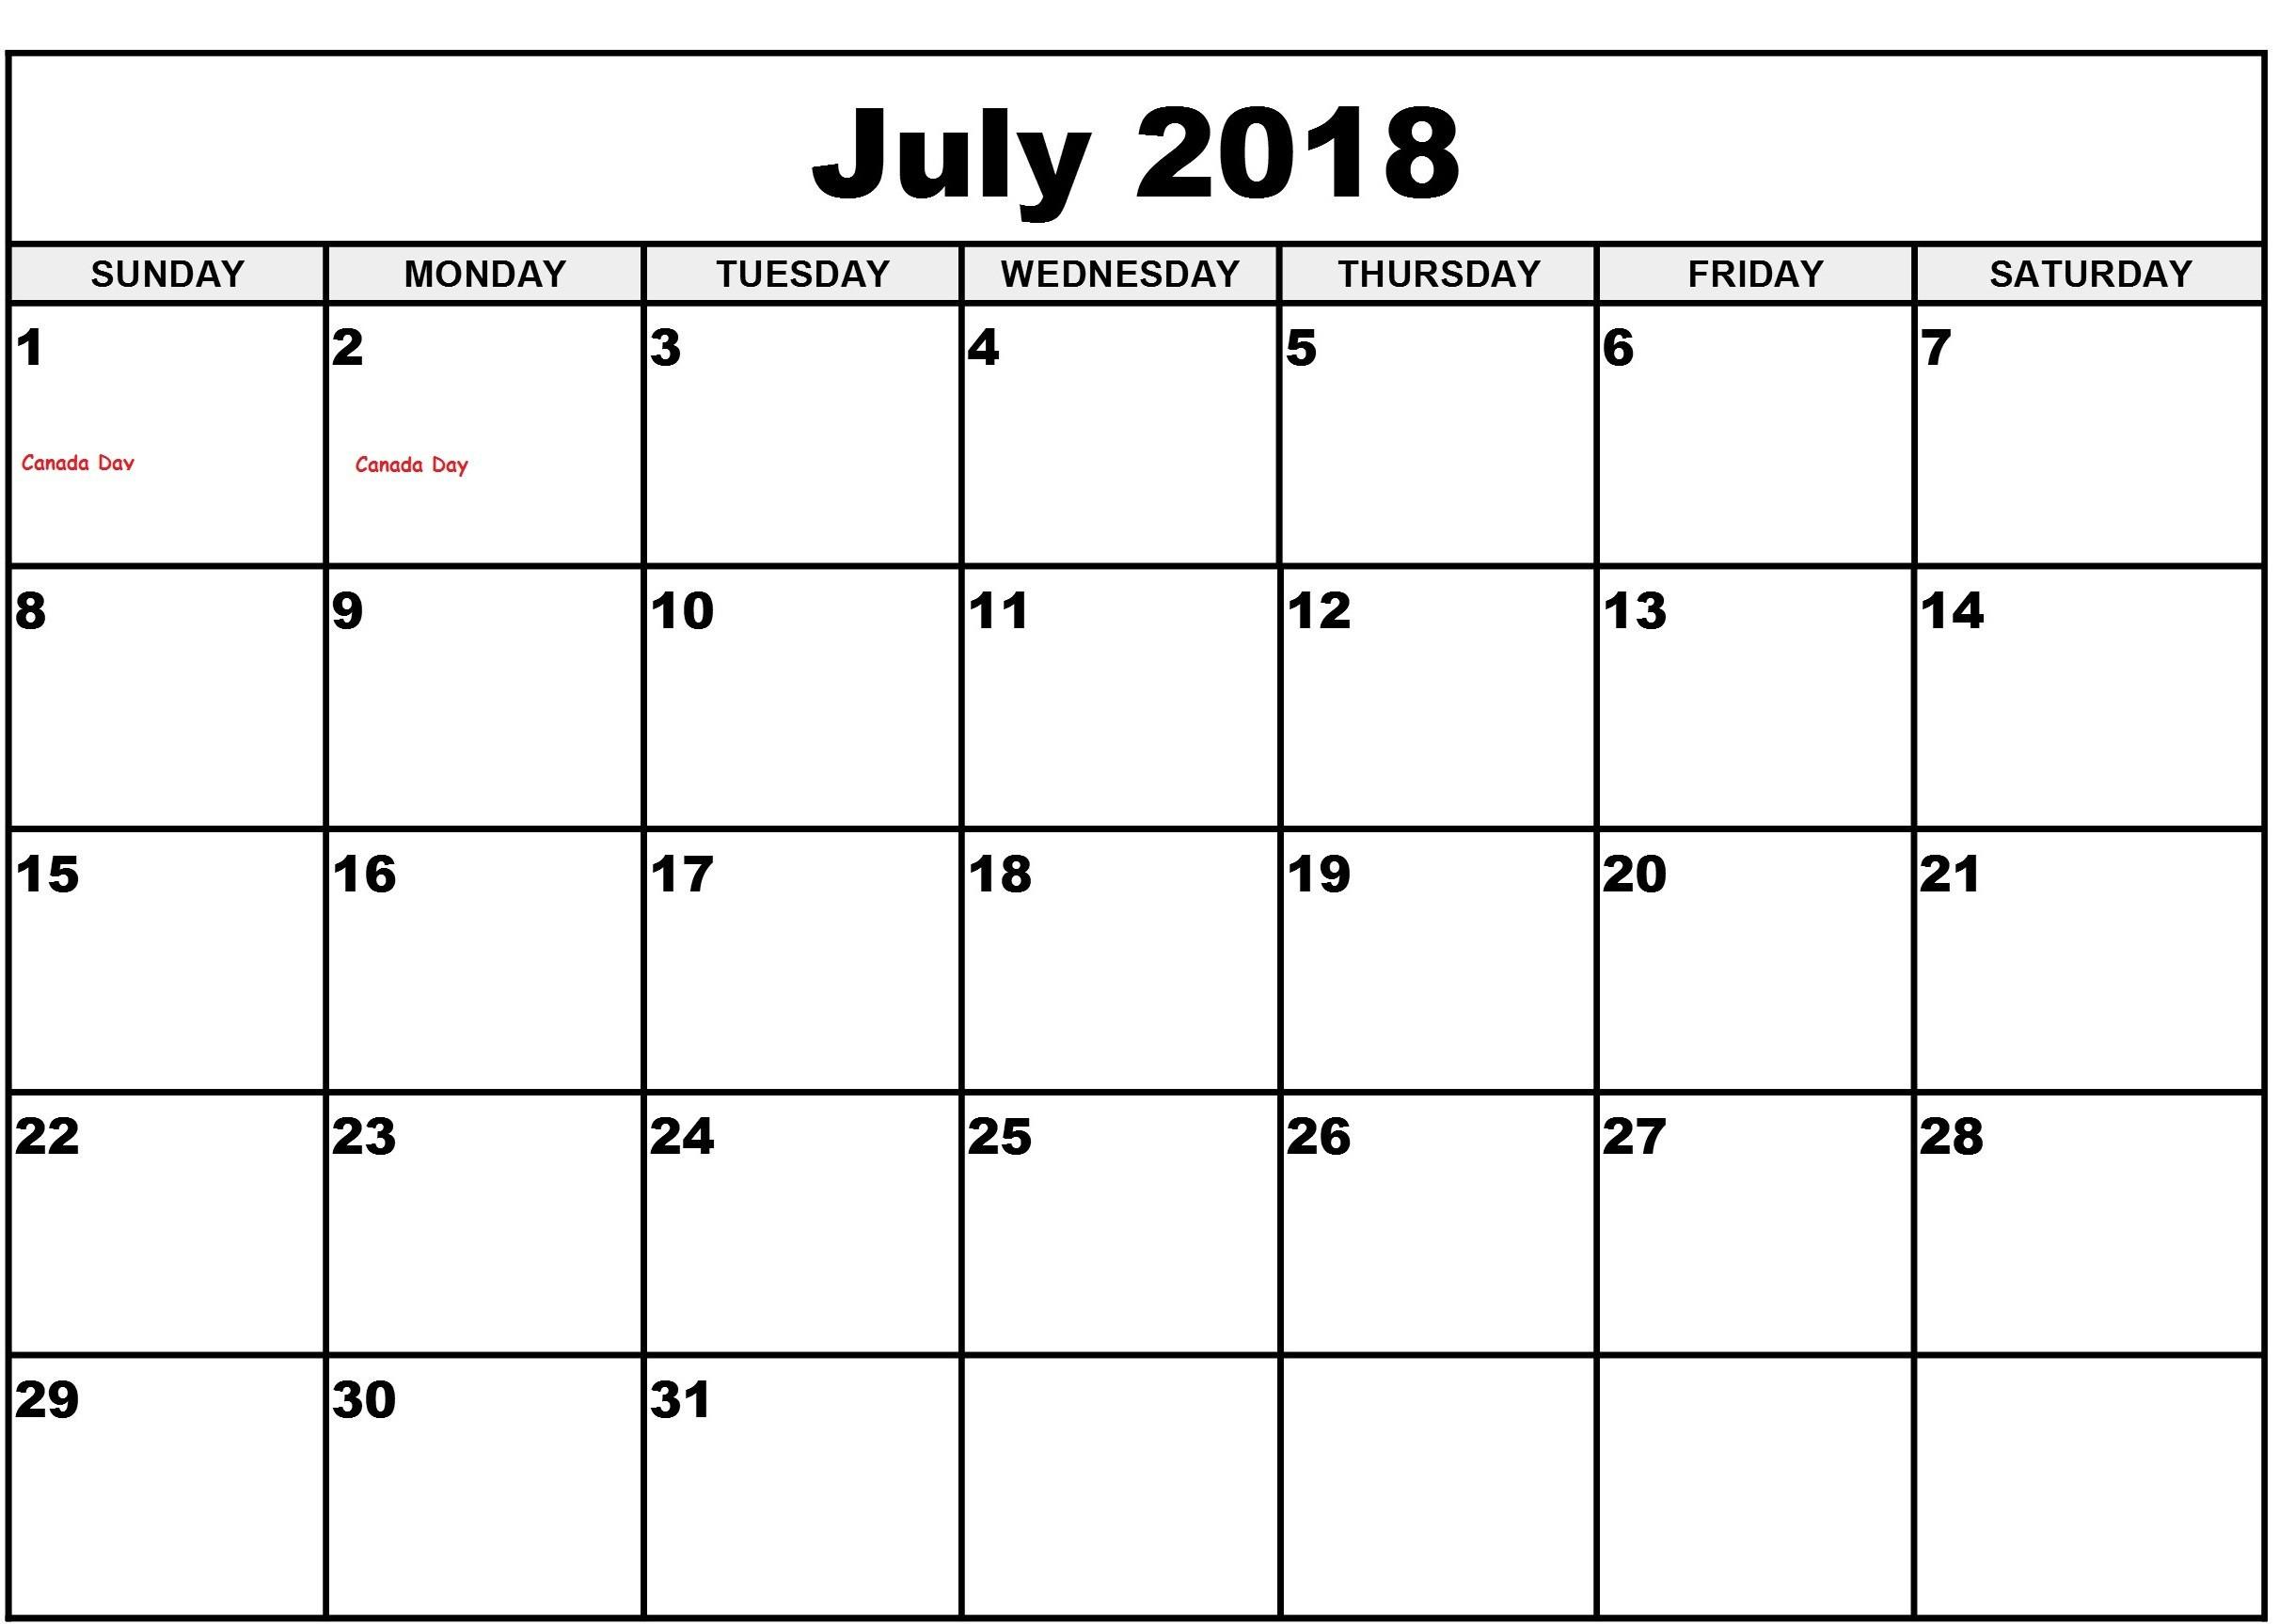 Blank Calendar July 2018 Printable Template Download - July 2019 throughout July Calendar Printable Template